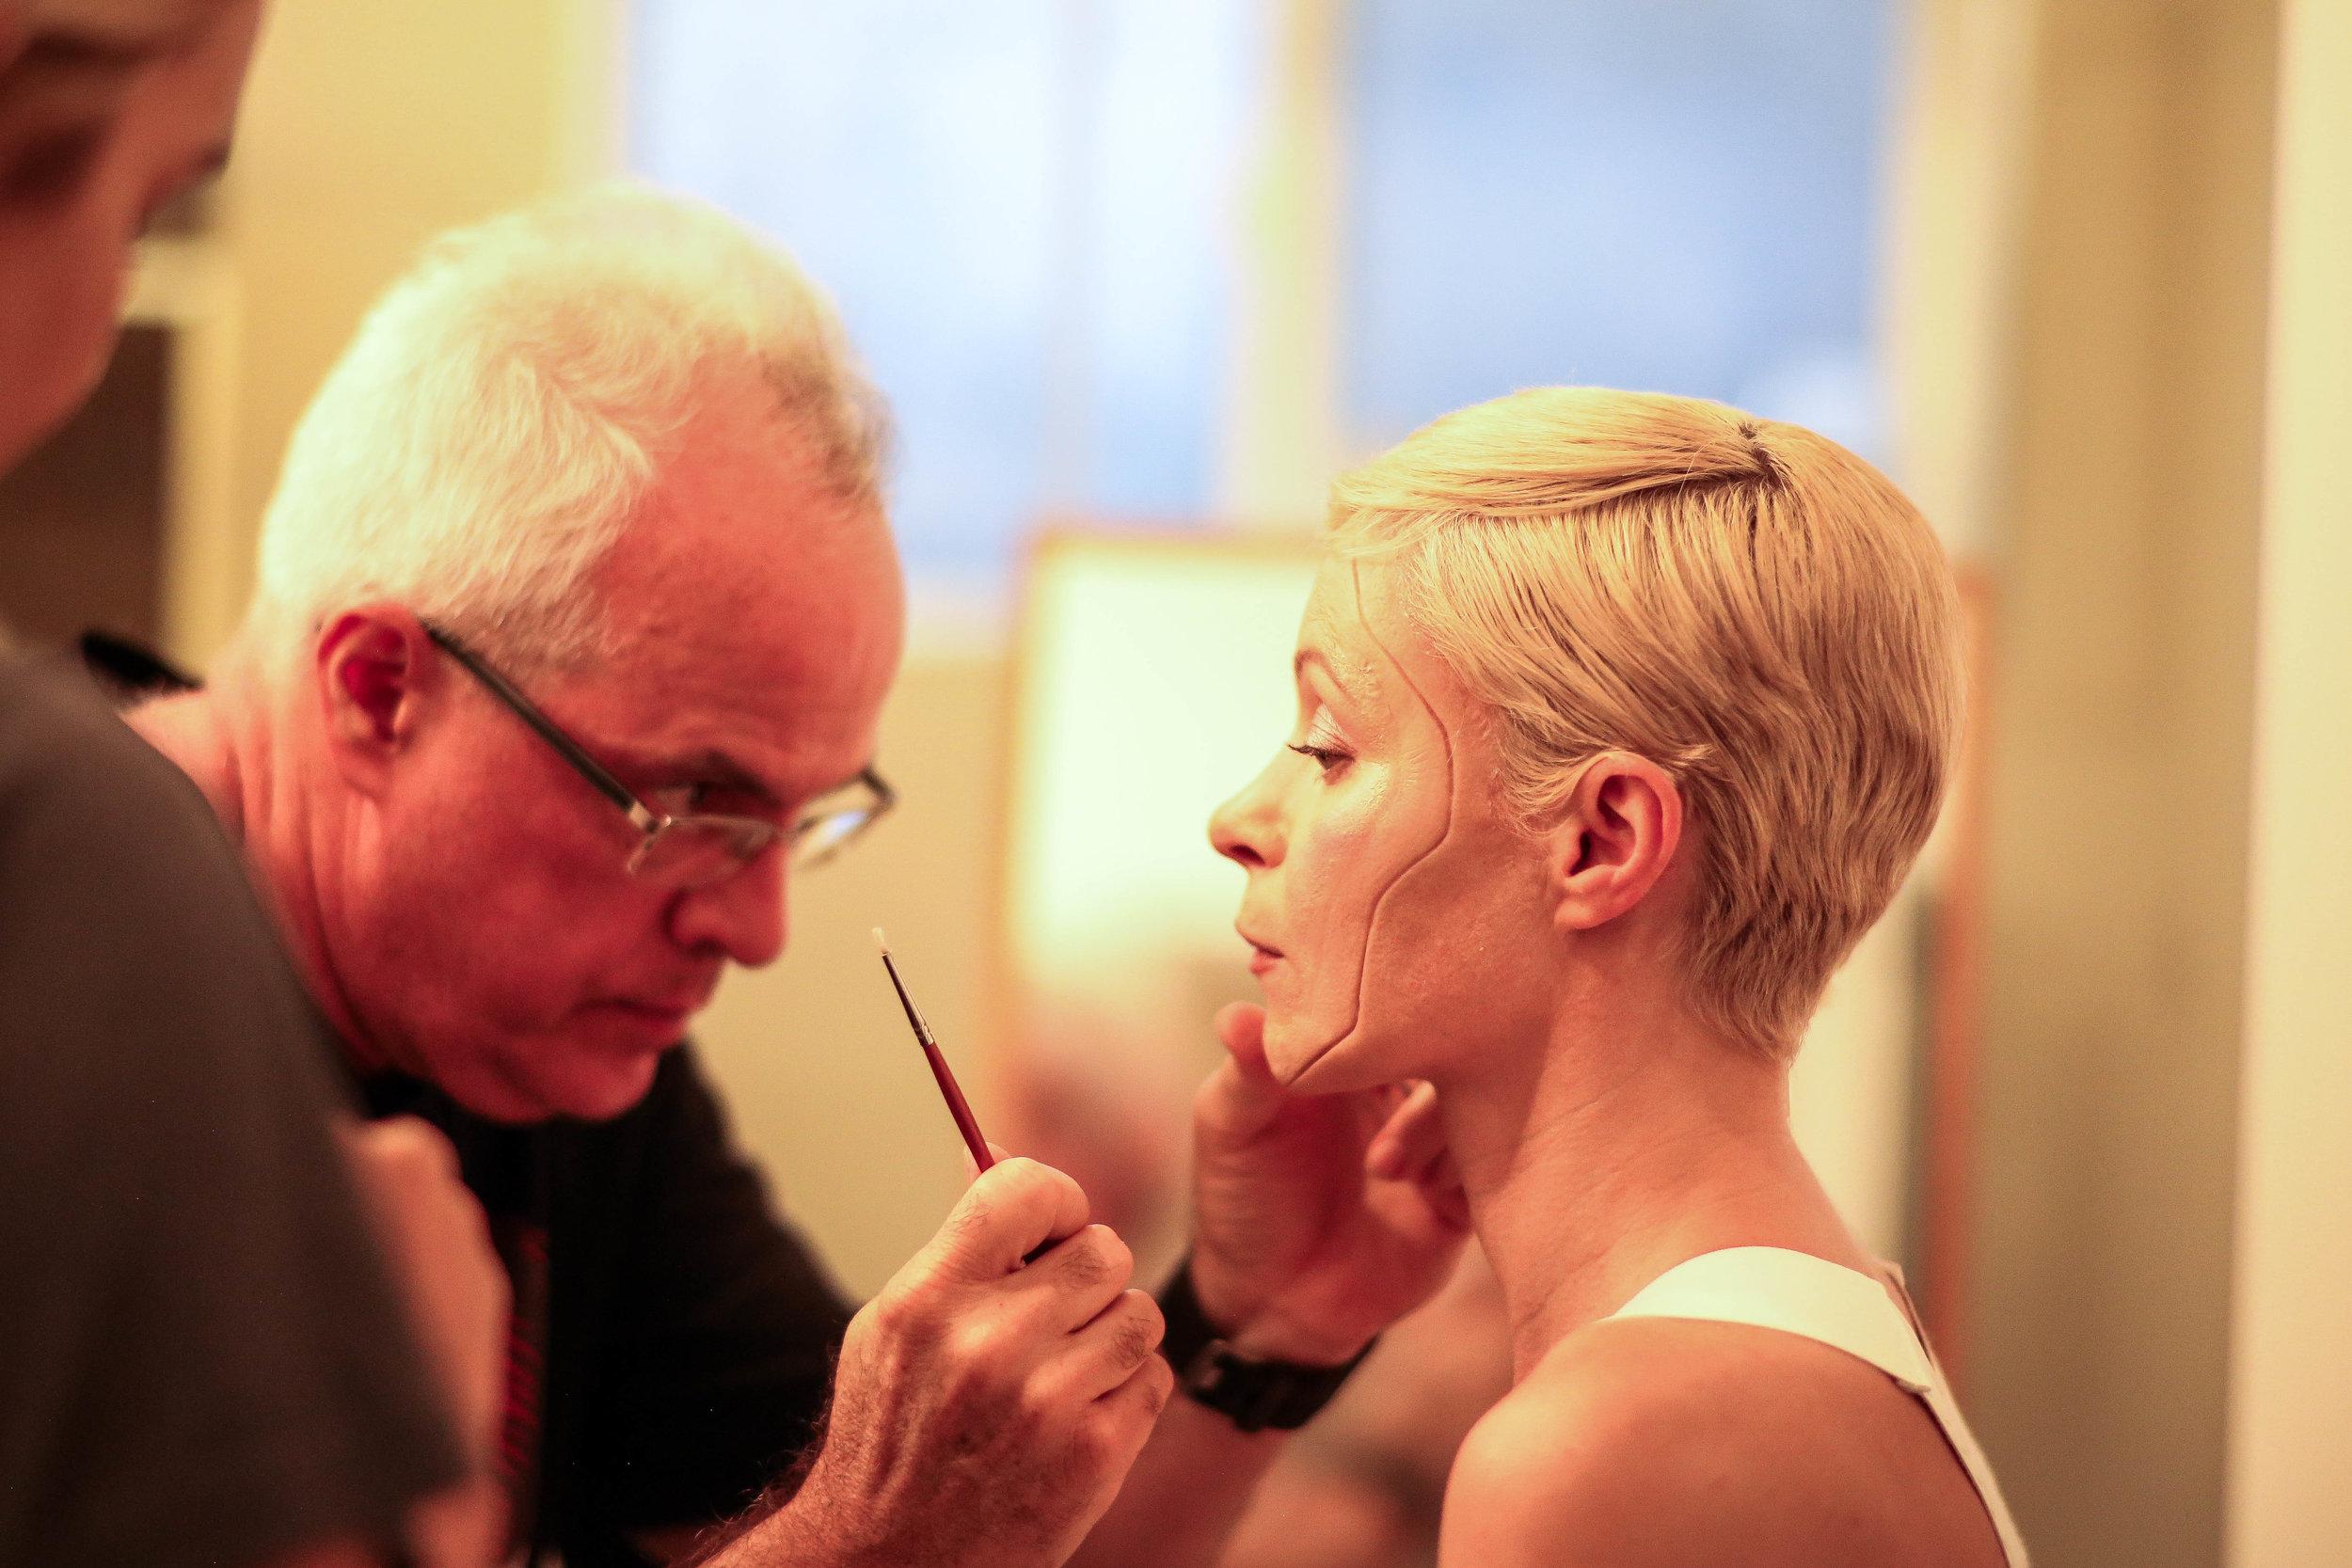 Legendary SPFX Makeup Artist Bart Mixon works on Kestrel Leah's prosthetic piece. Photo credit Di Wei.